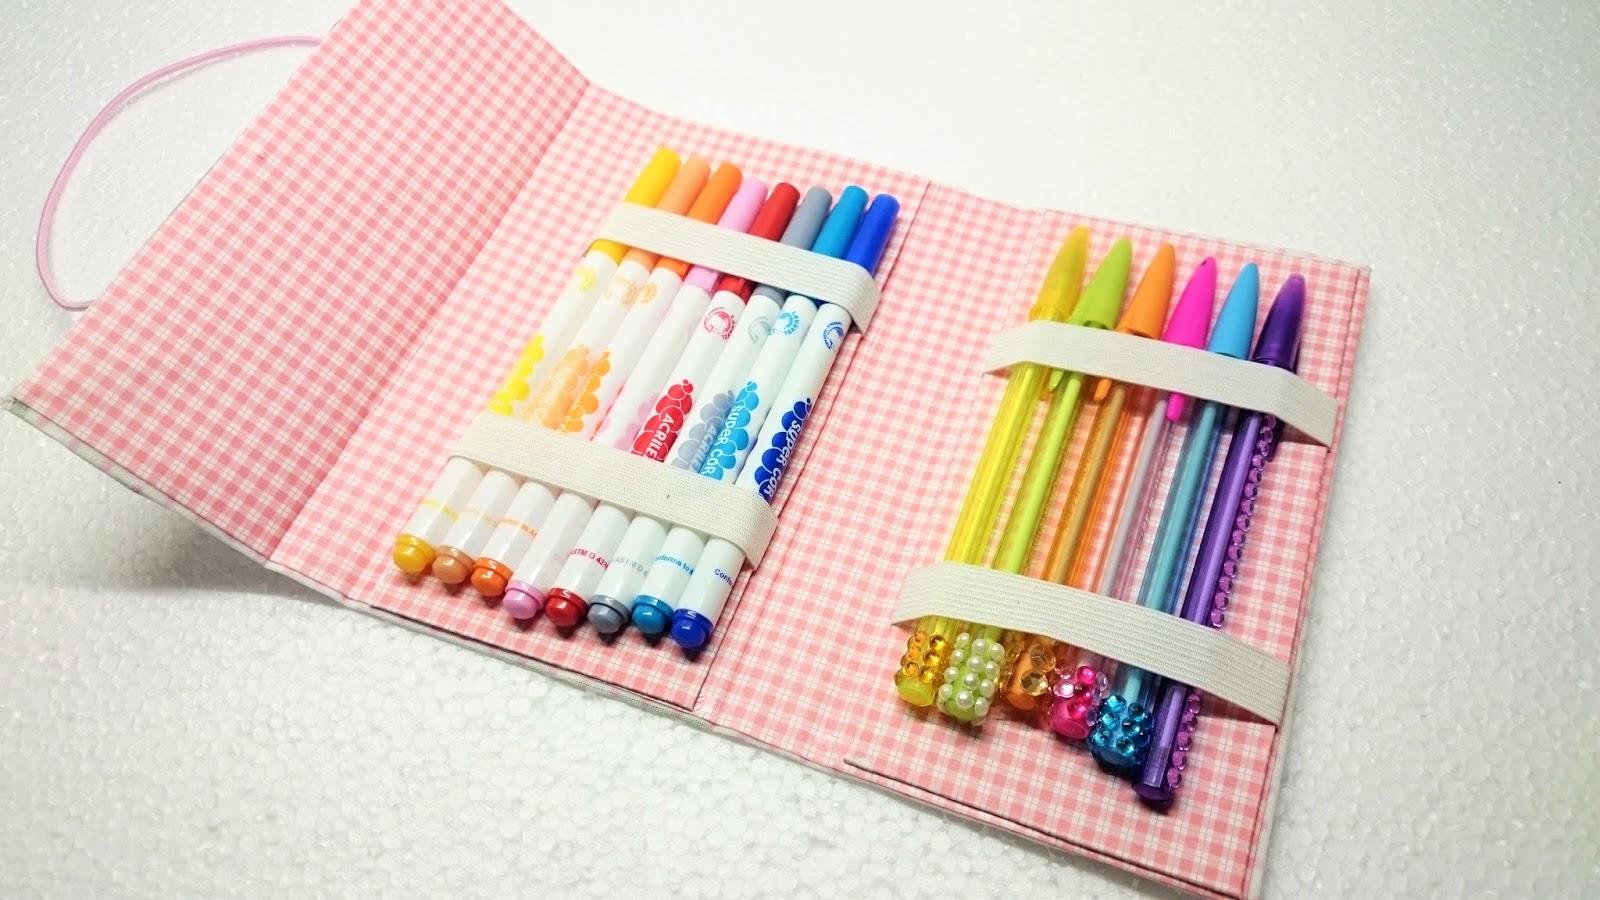 Artesanato Sustentável ~ Artesanato Viviane Magalh u00e3es DIY Estojo com Caixa de Leite Back to School